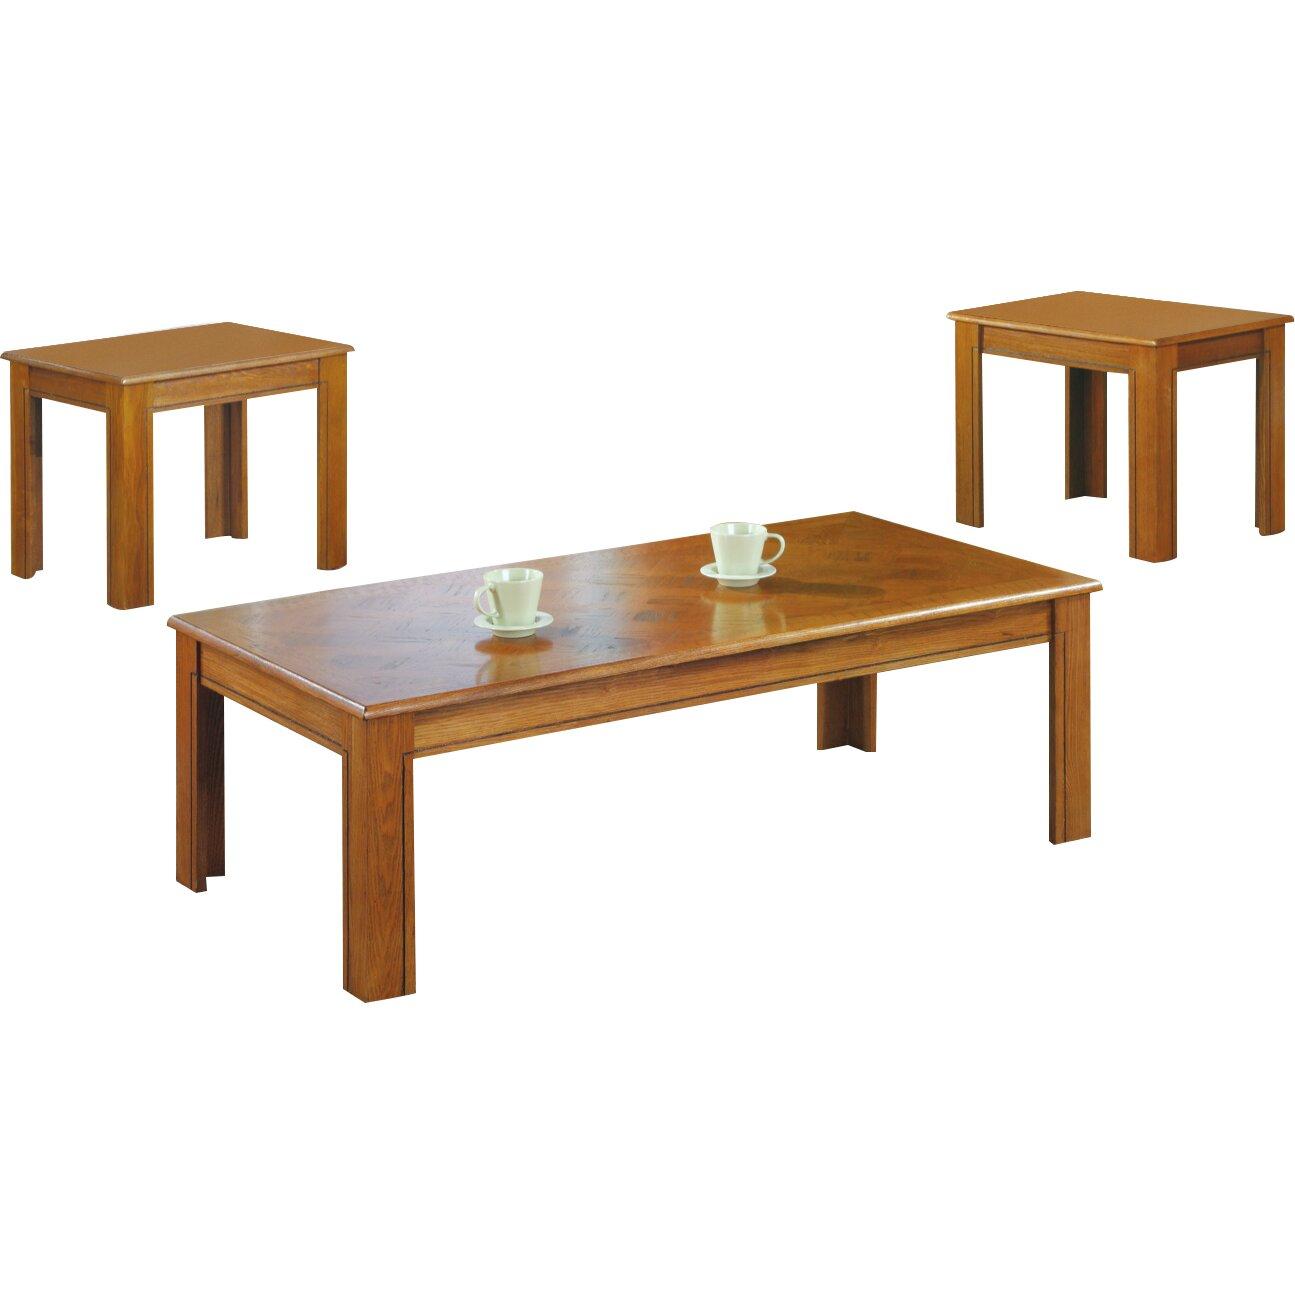 junction city 3 piece coffee table set wayfair. Black Bedroom Furniture Sets. Home Design Ideas